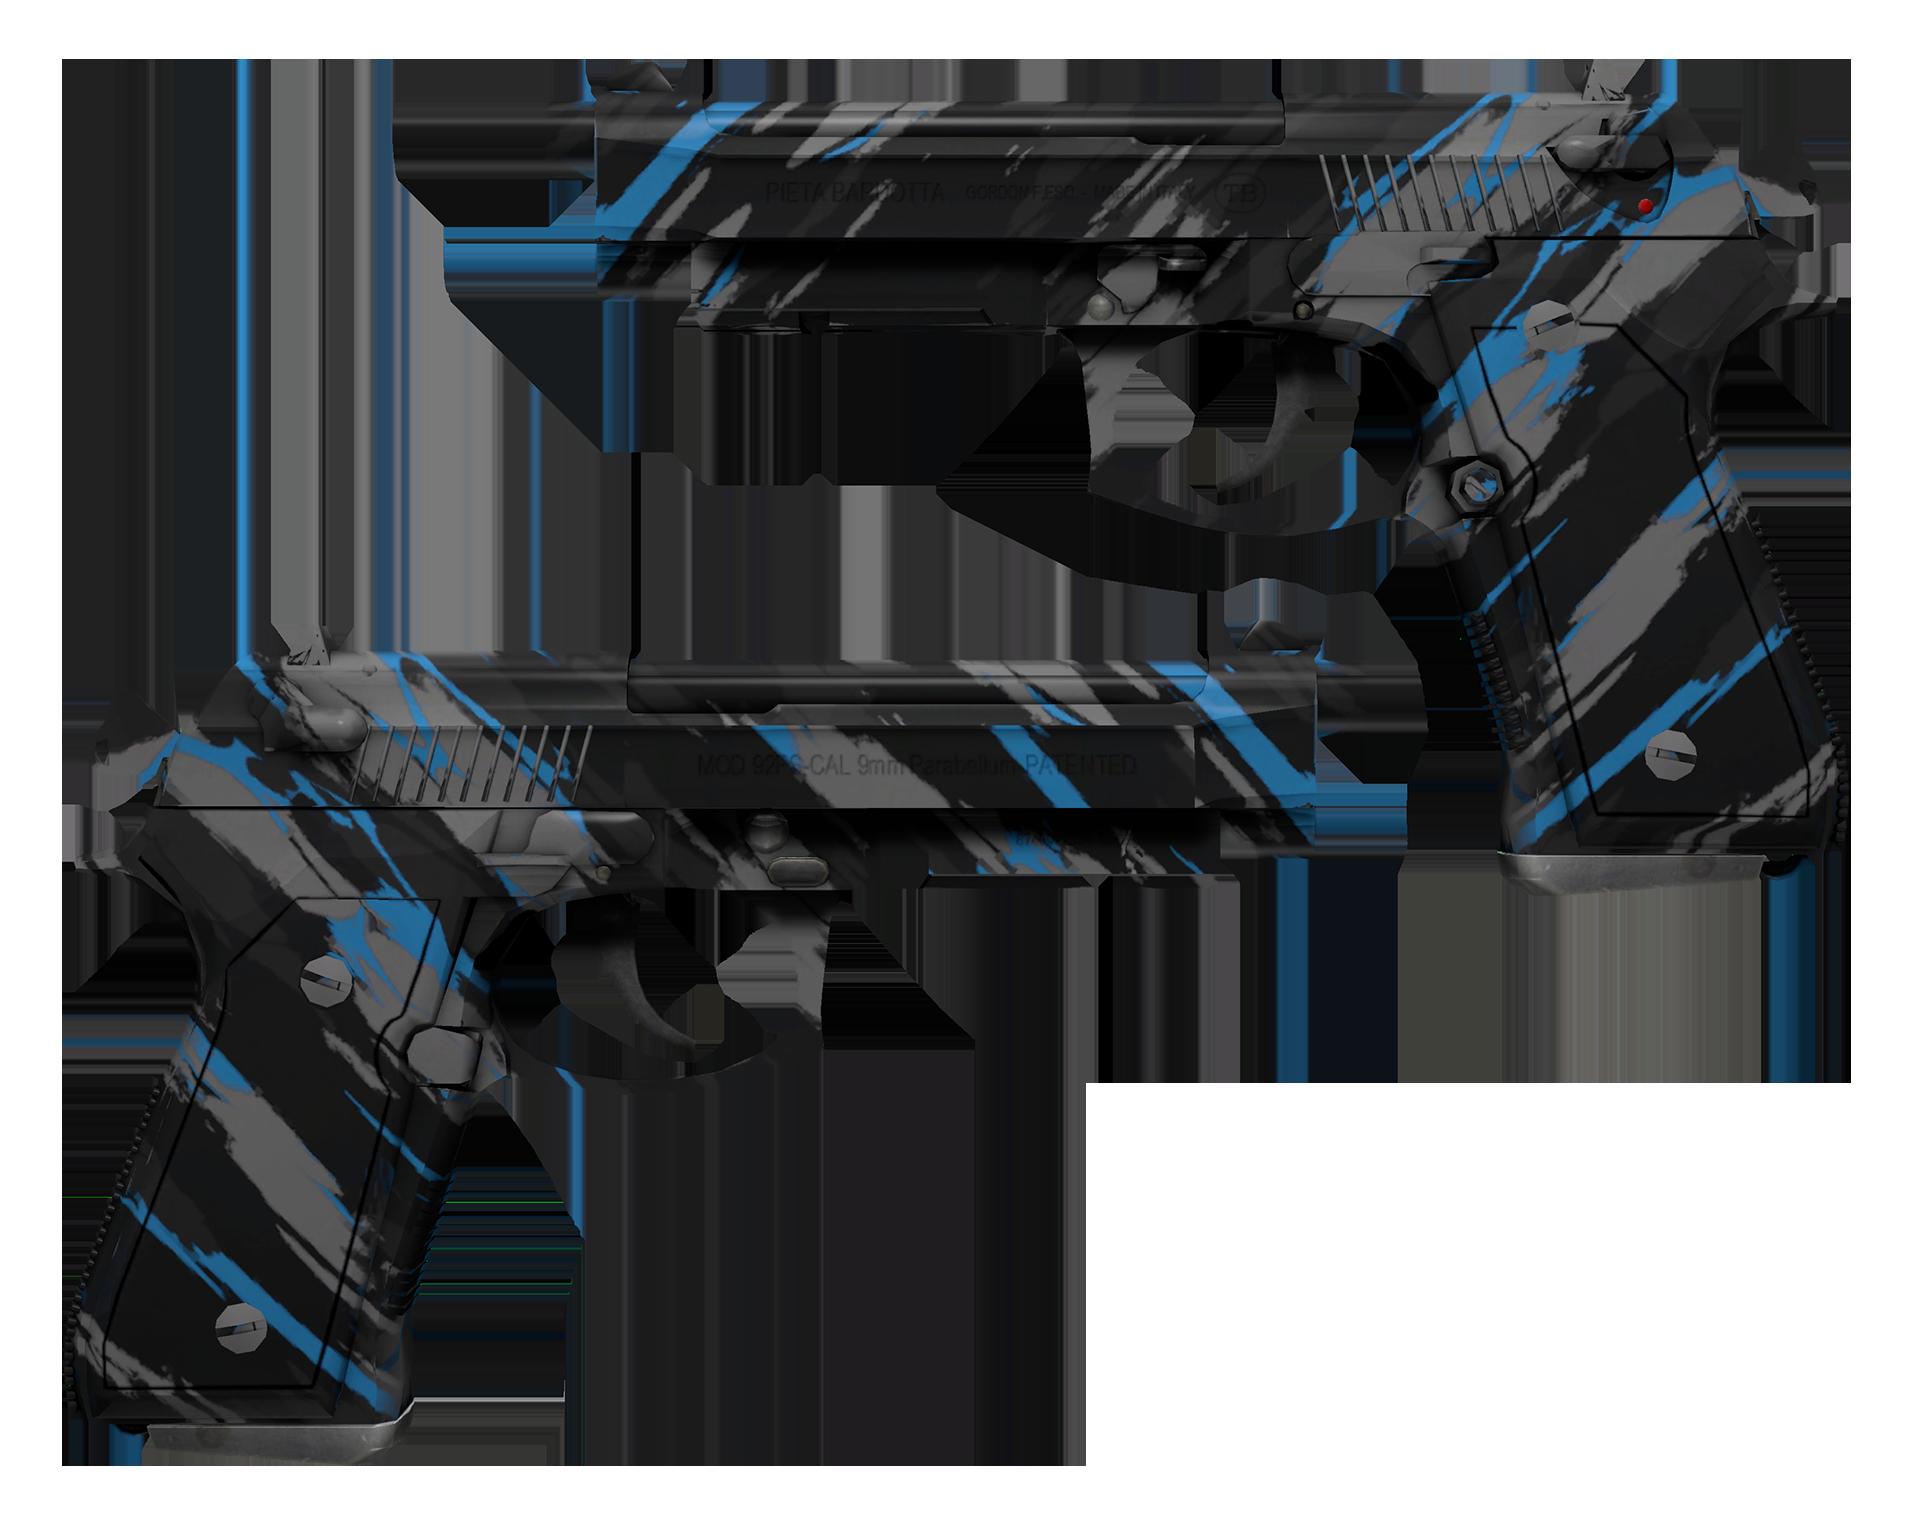 Dual Berettas Shred Large Rendering